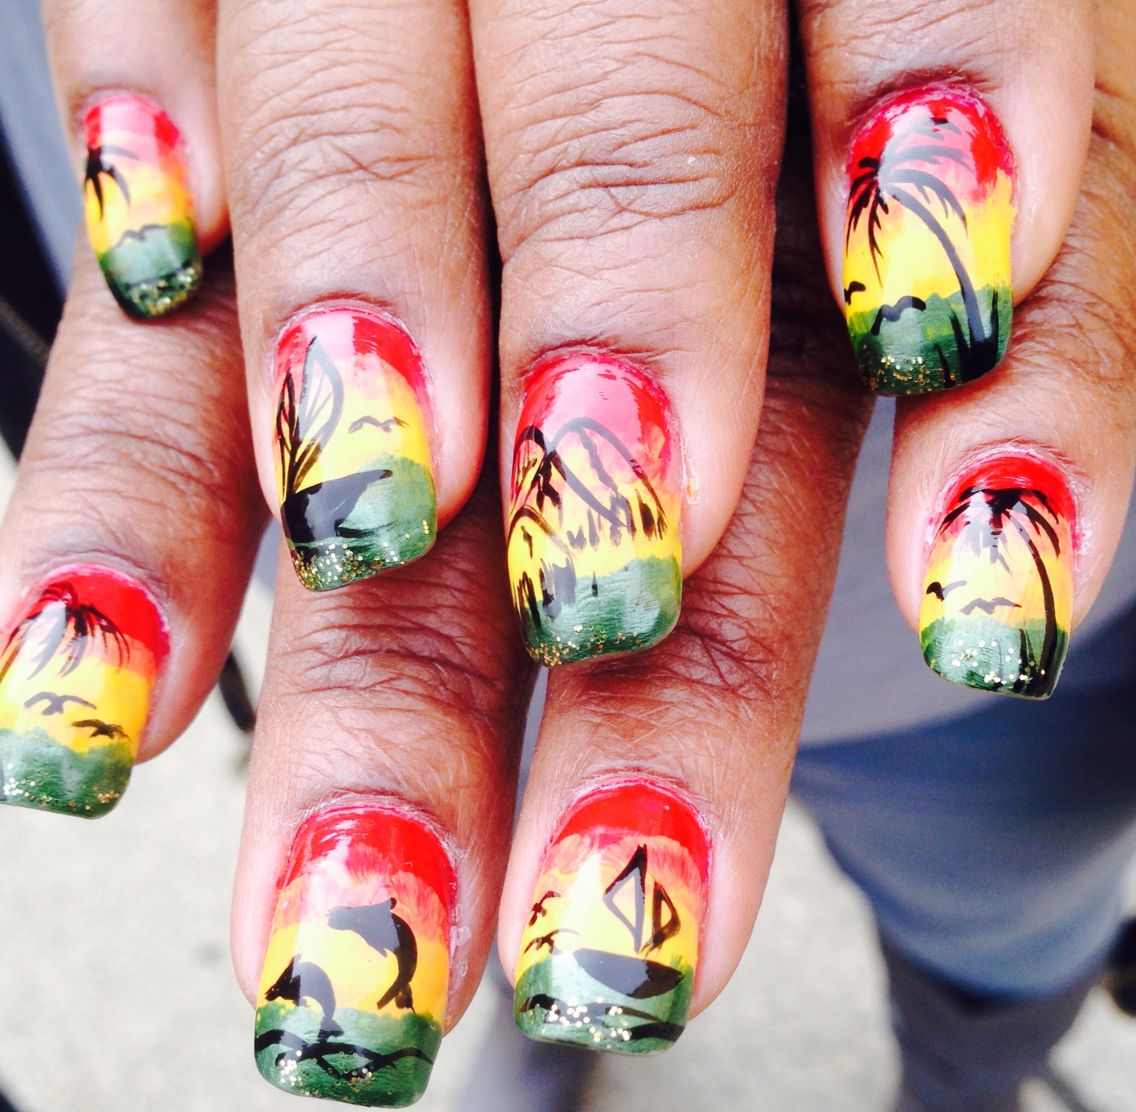 Jamaican Nail Art | uñas decoradas con paisajes | Pinterest | Arte ...